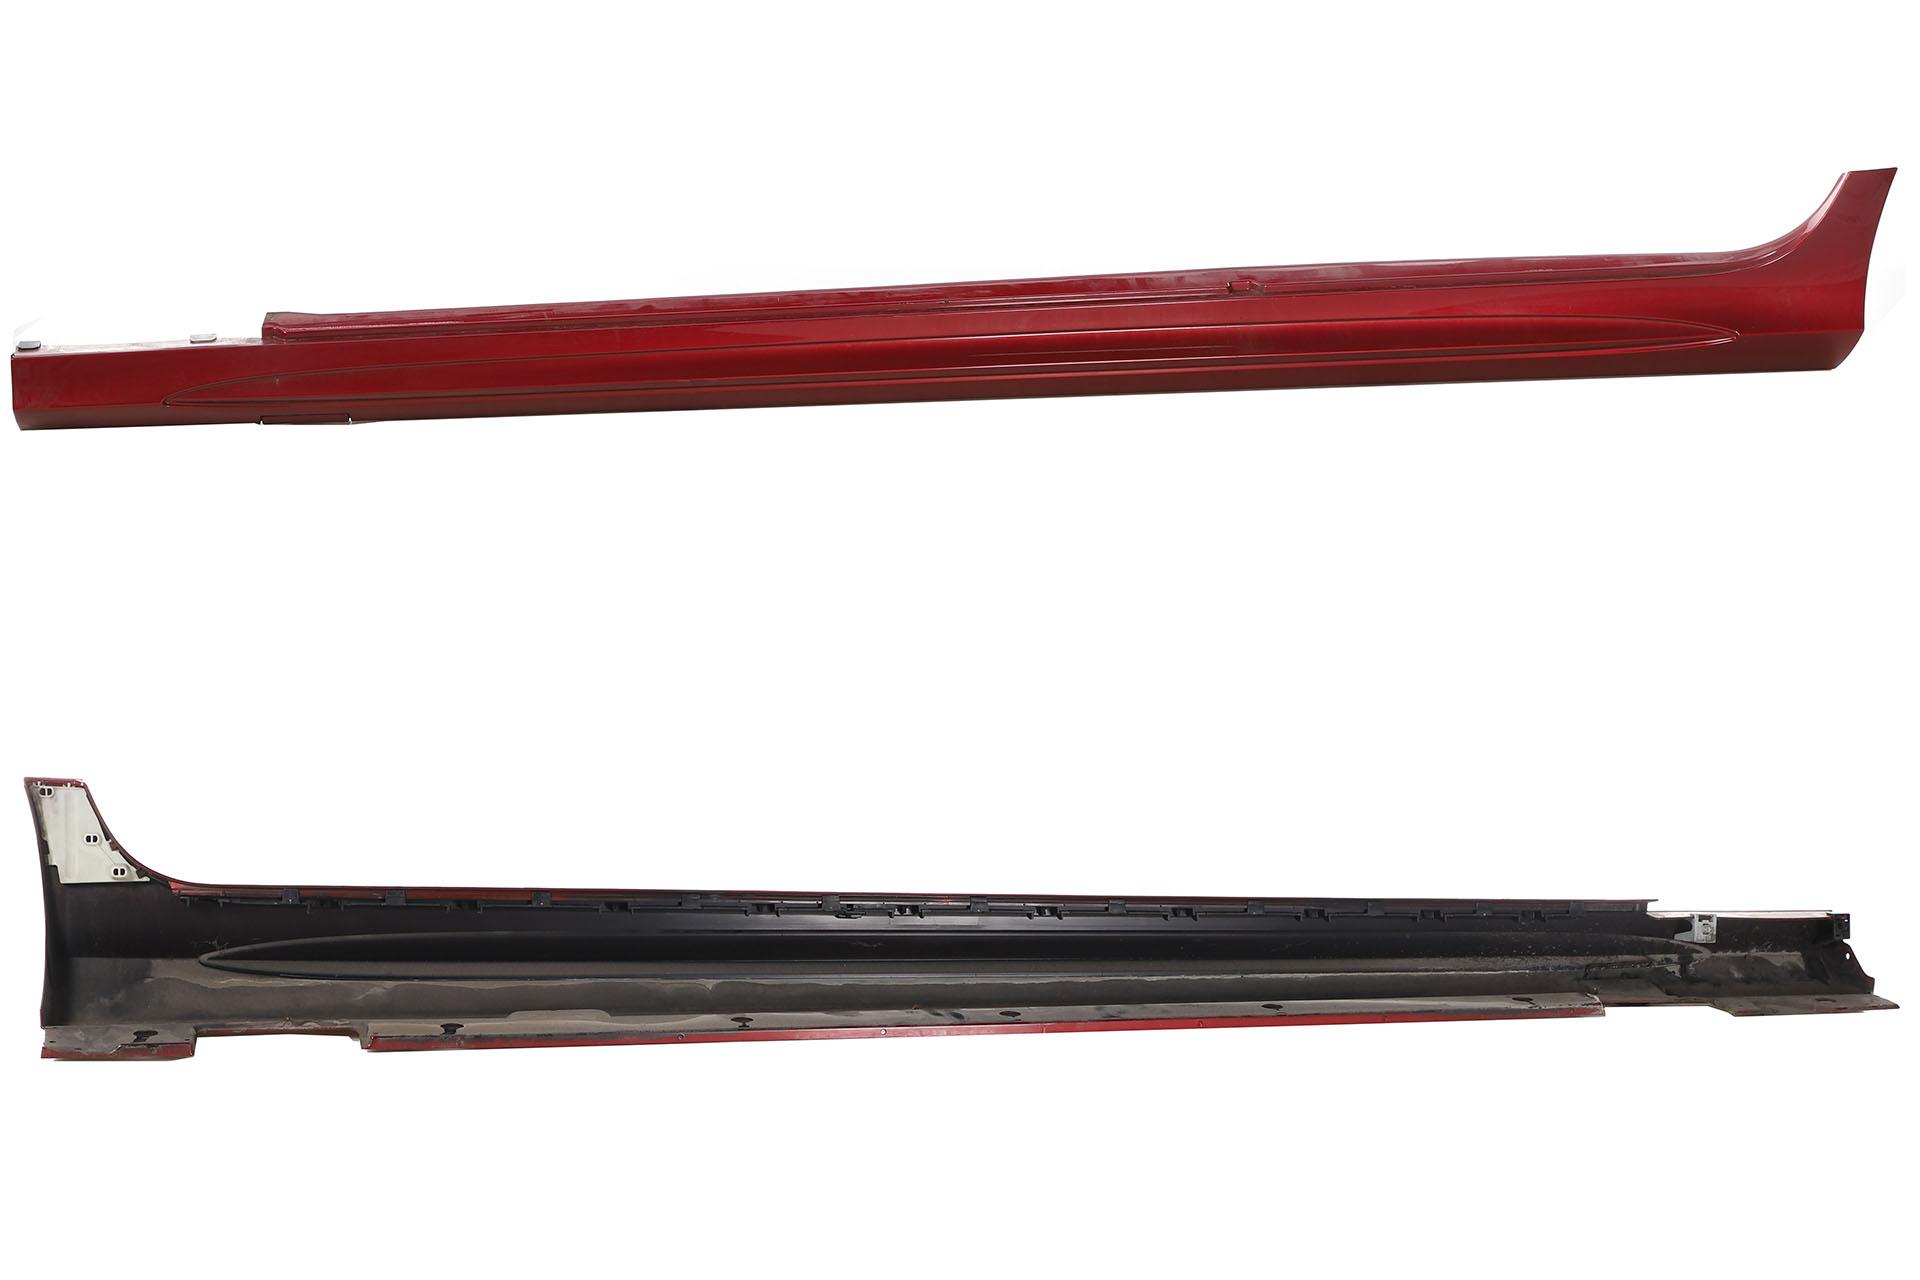 IXOSP18-43001 Lastwagen Stütz Tablett mit Plane Mercedes L325 Aux Farben H